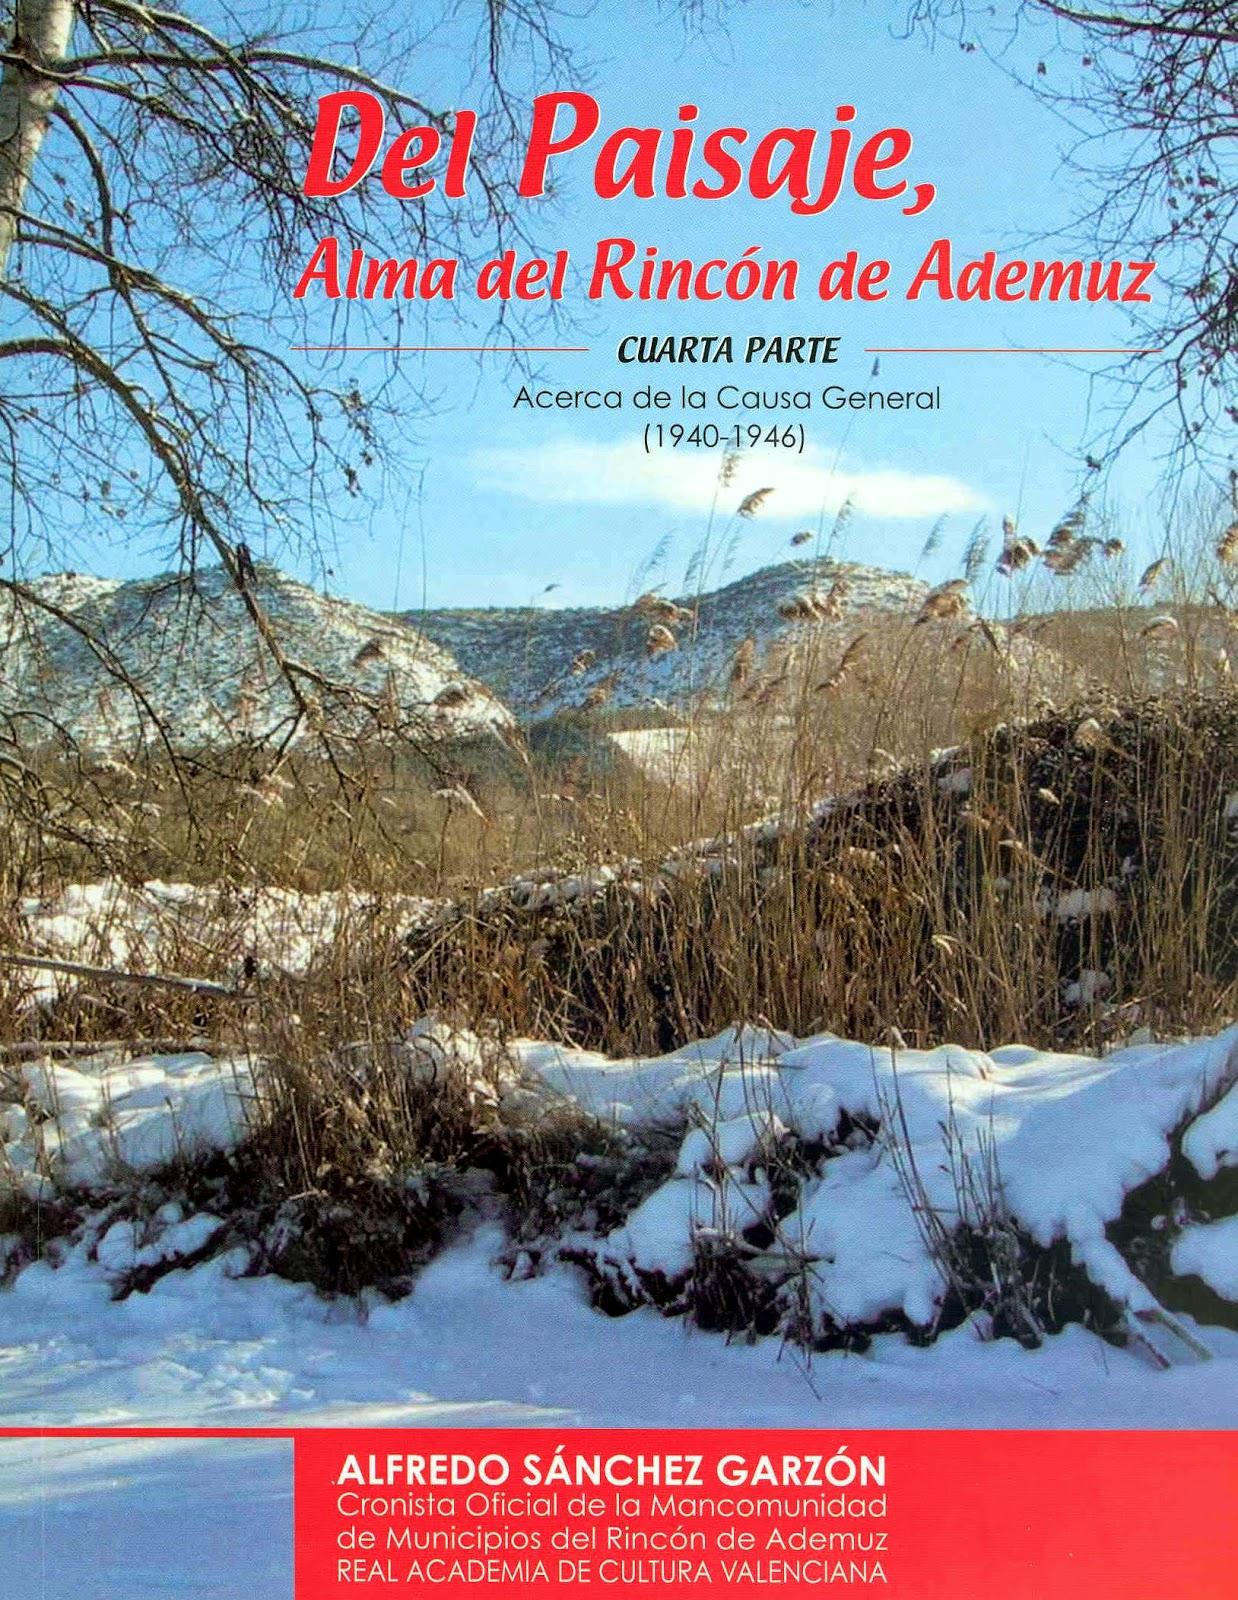 paisaje-rincon-ademuz-alfredo-sanchez-garzon-2011